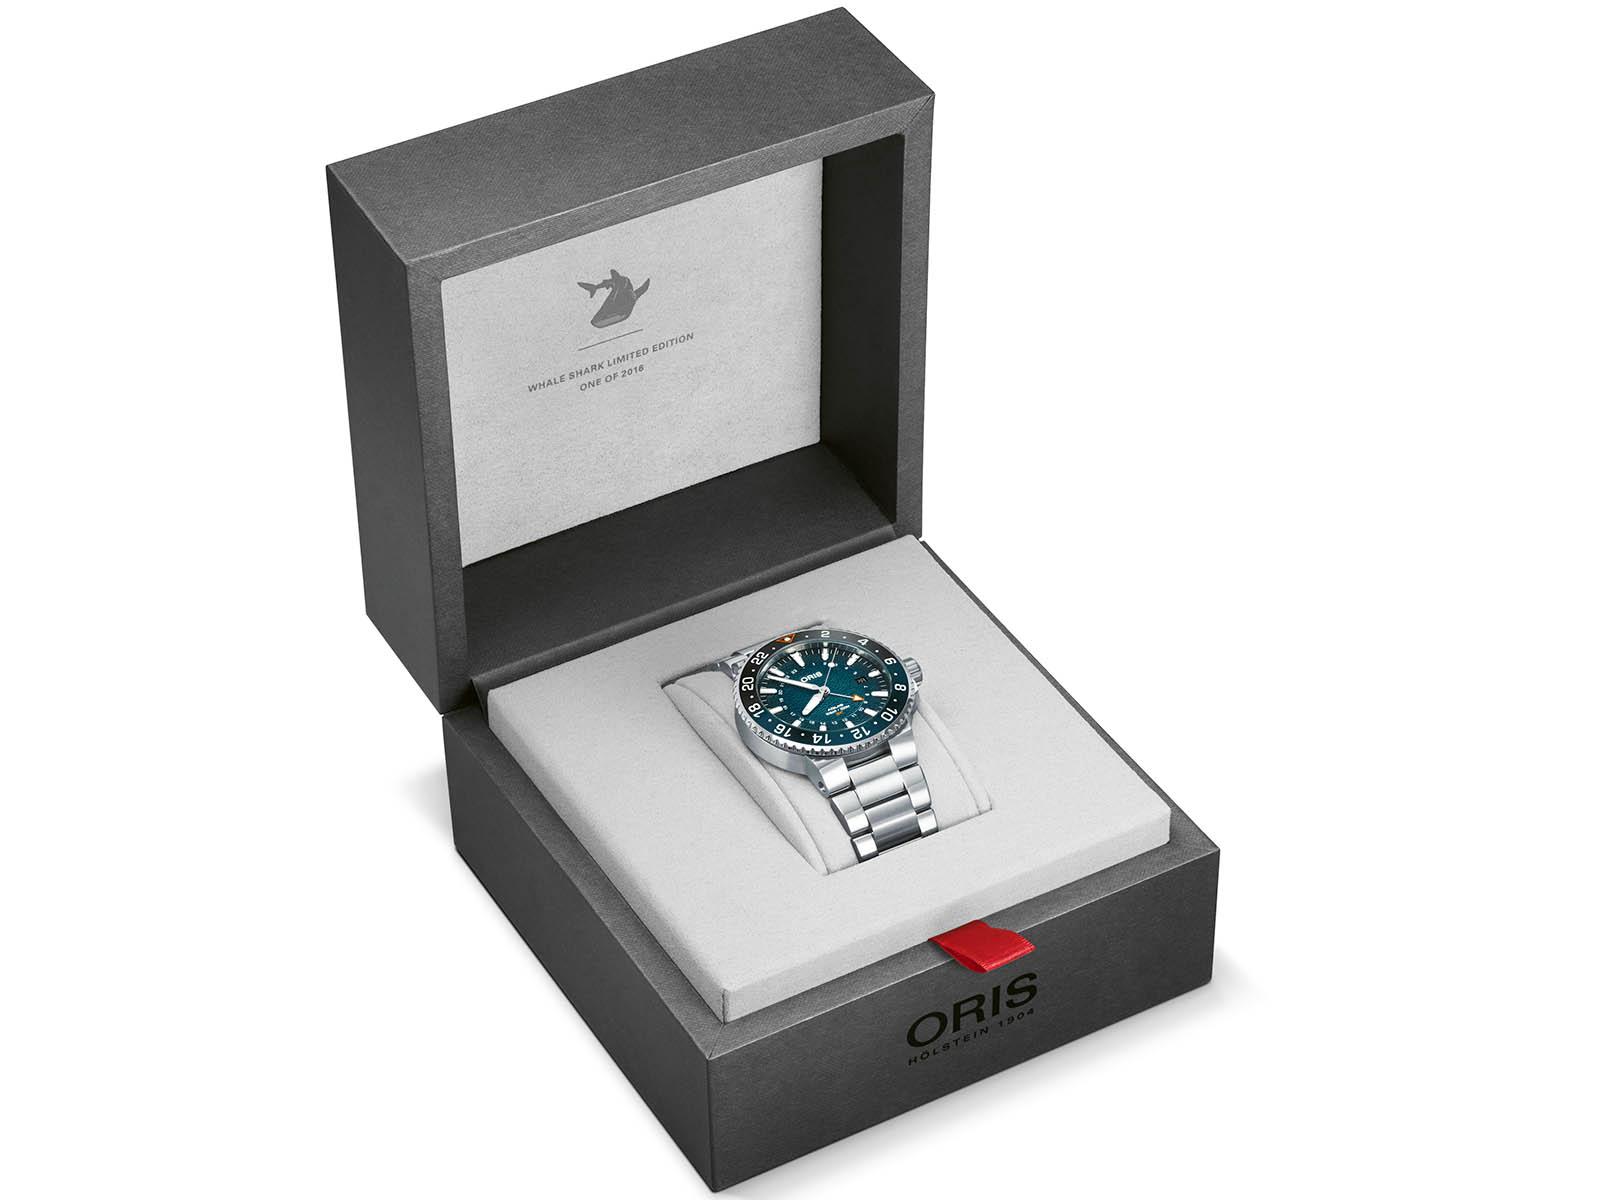 798-7754-4175-set-mb-oris-aquis-gmt-date-whale-shark-limited-edition-11.jpg